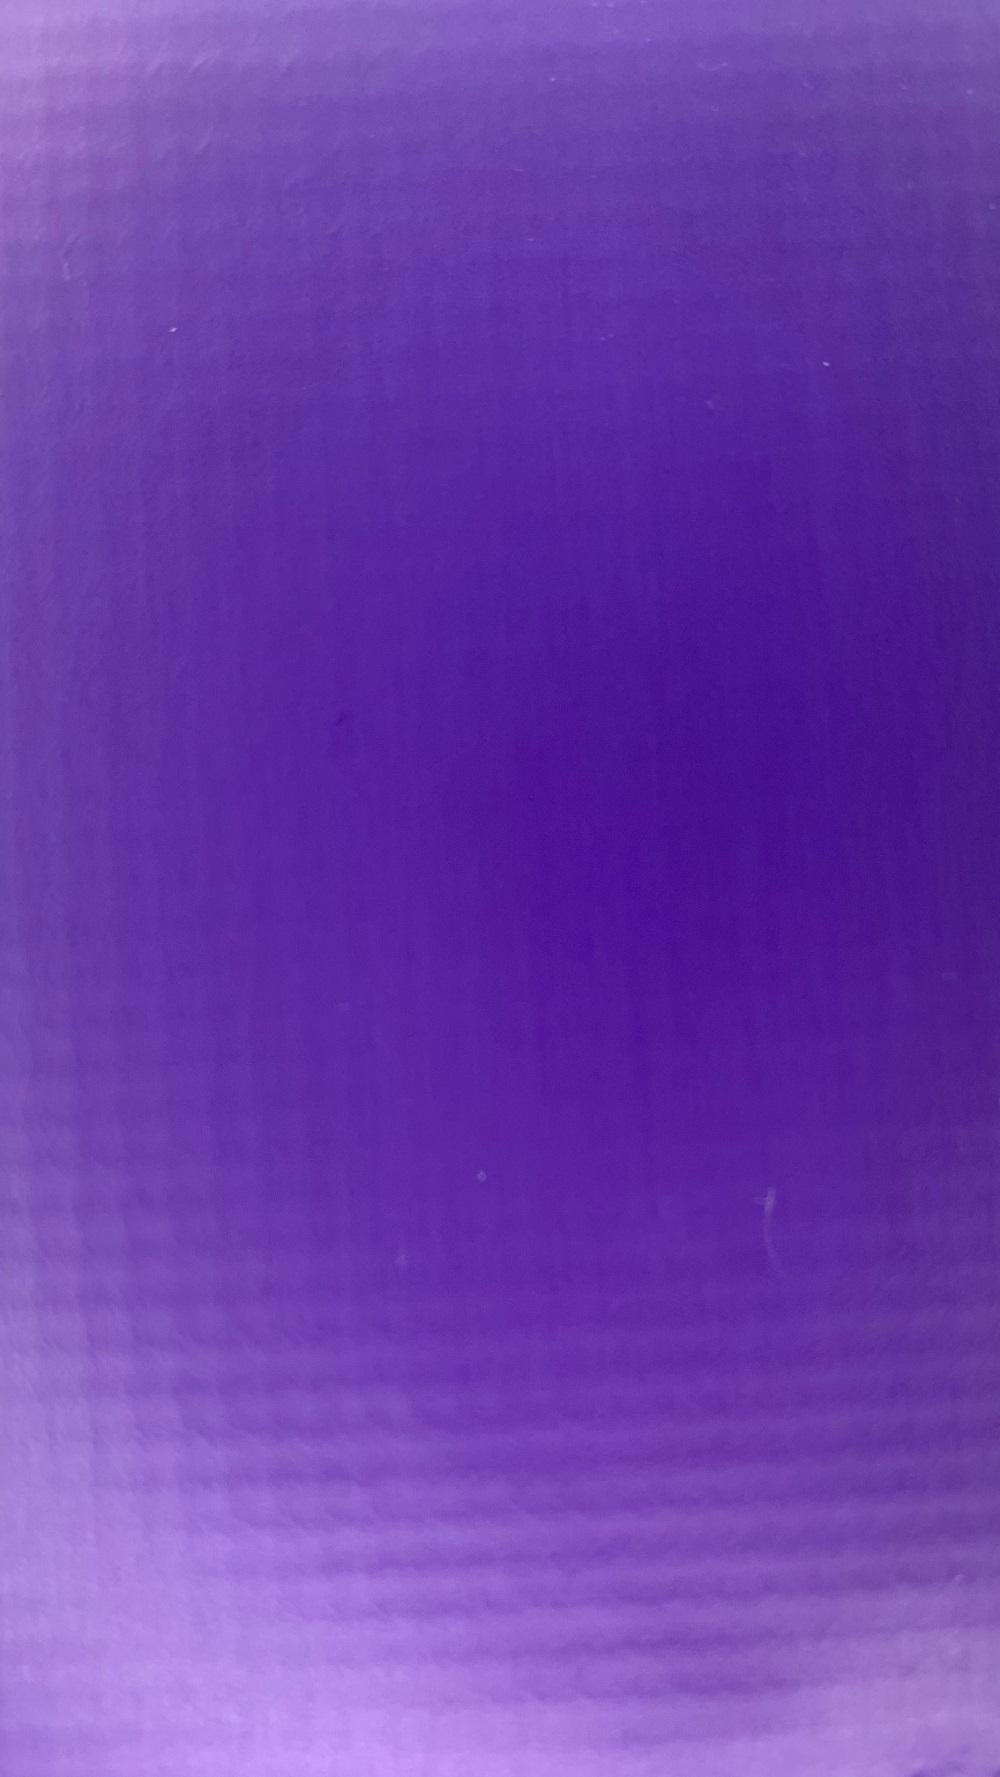 Lona Vinilona Df Fosca Violeta S-022 1,45mt X 1,0mt